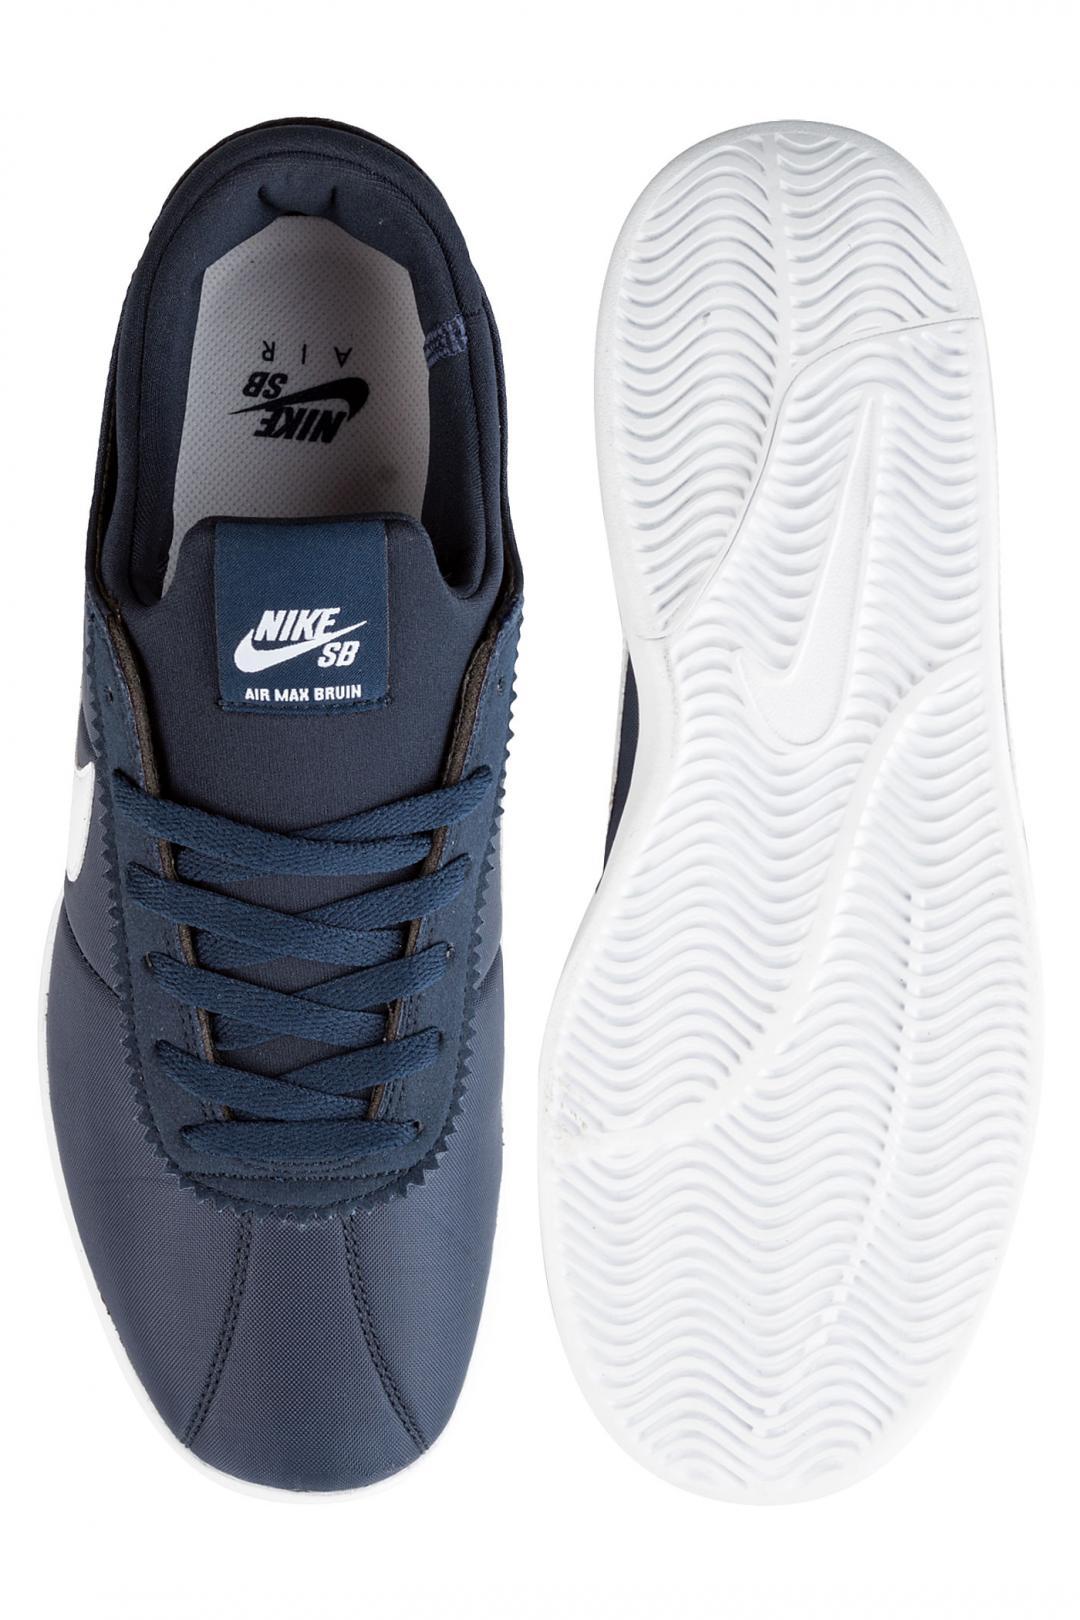 Uomo Nike SB Air Max Bruin Vapor Textile obsidian white | Scarpe da skate